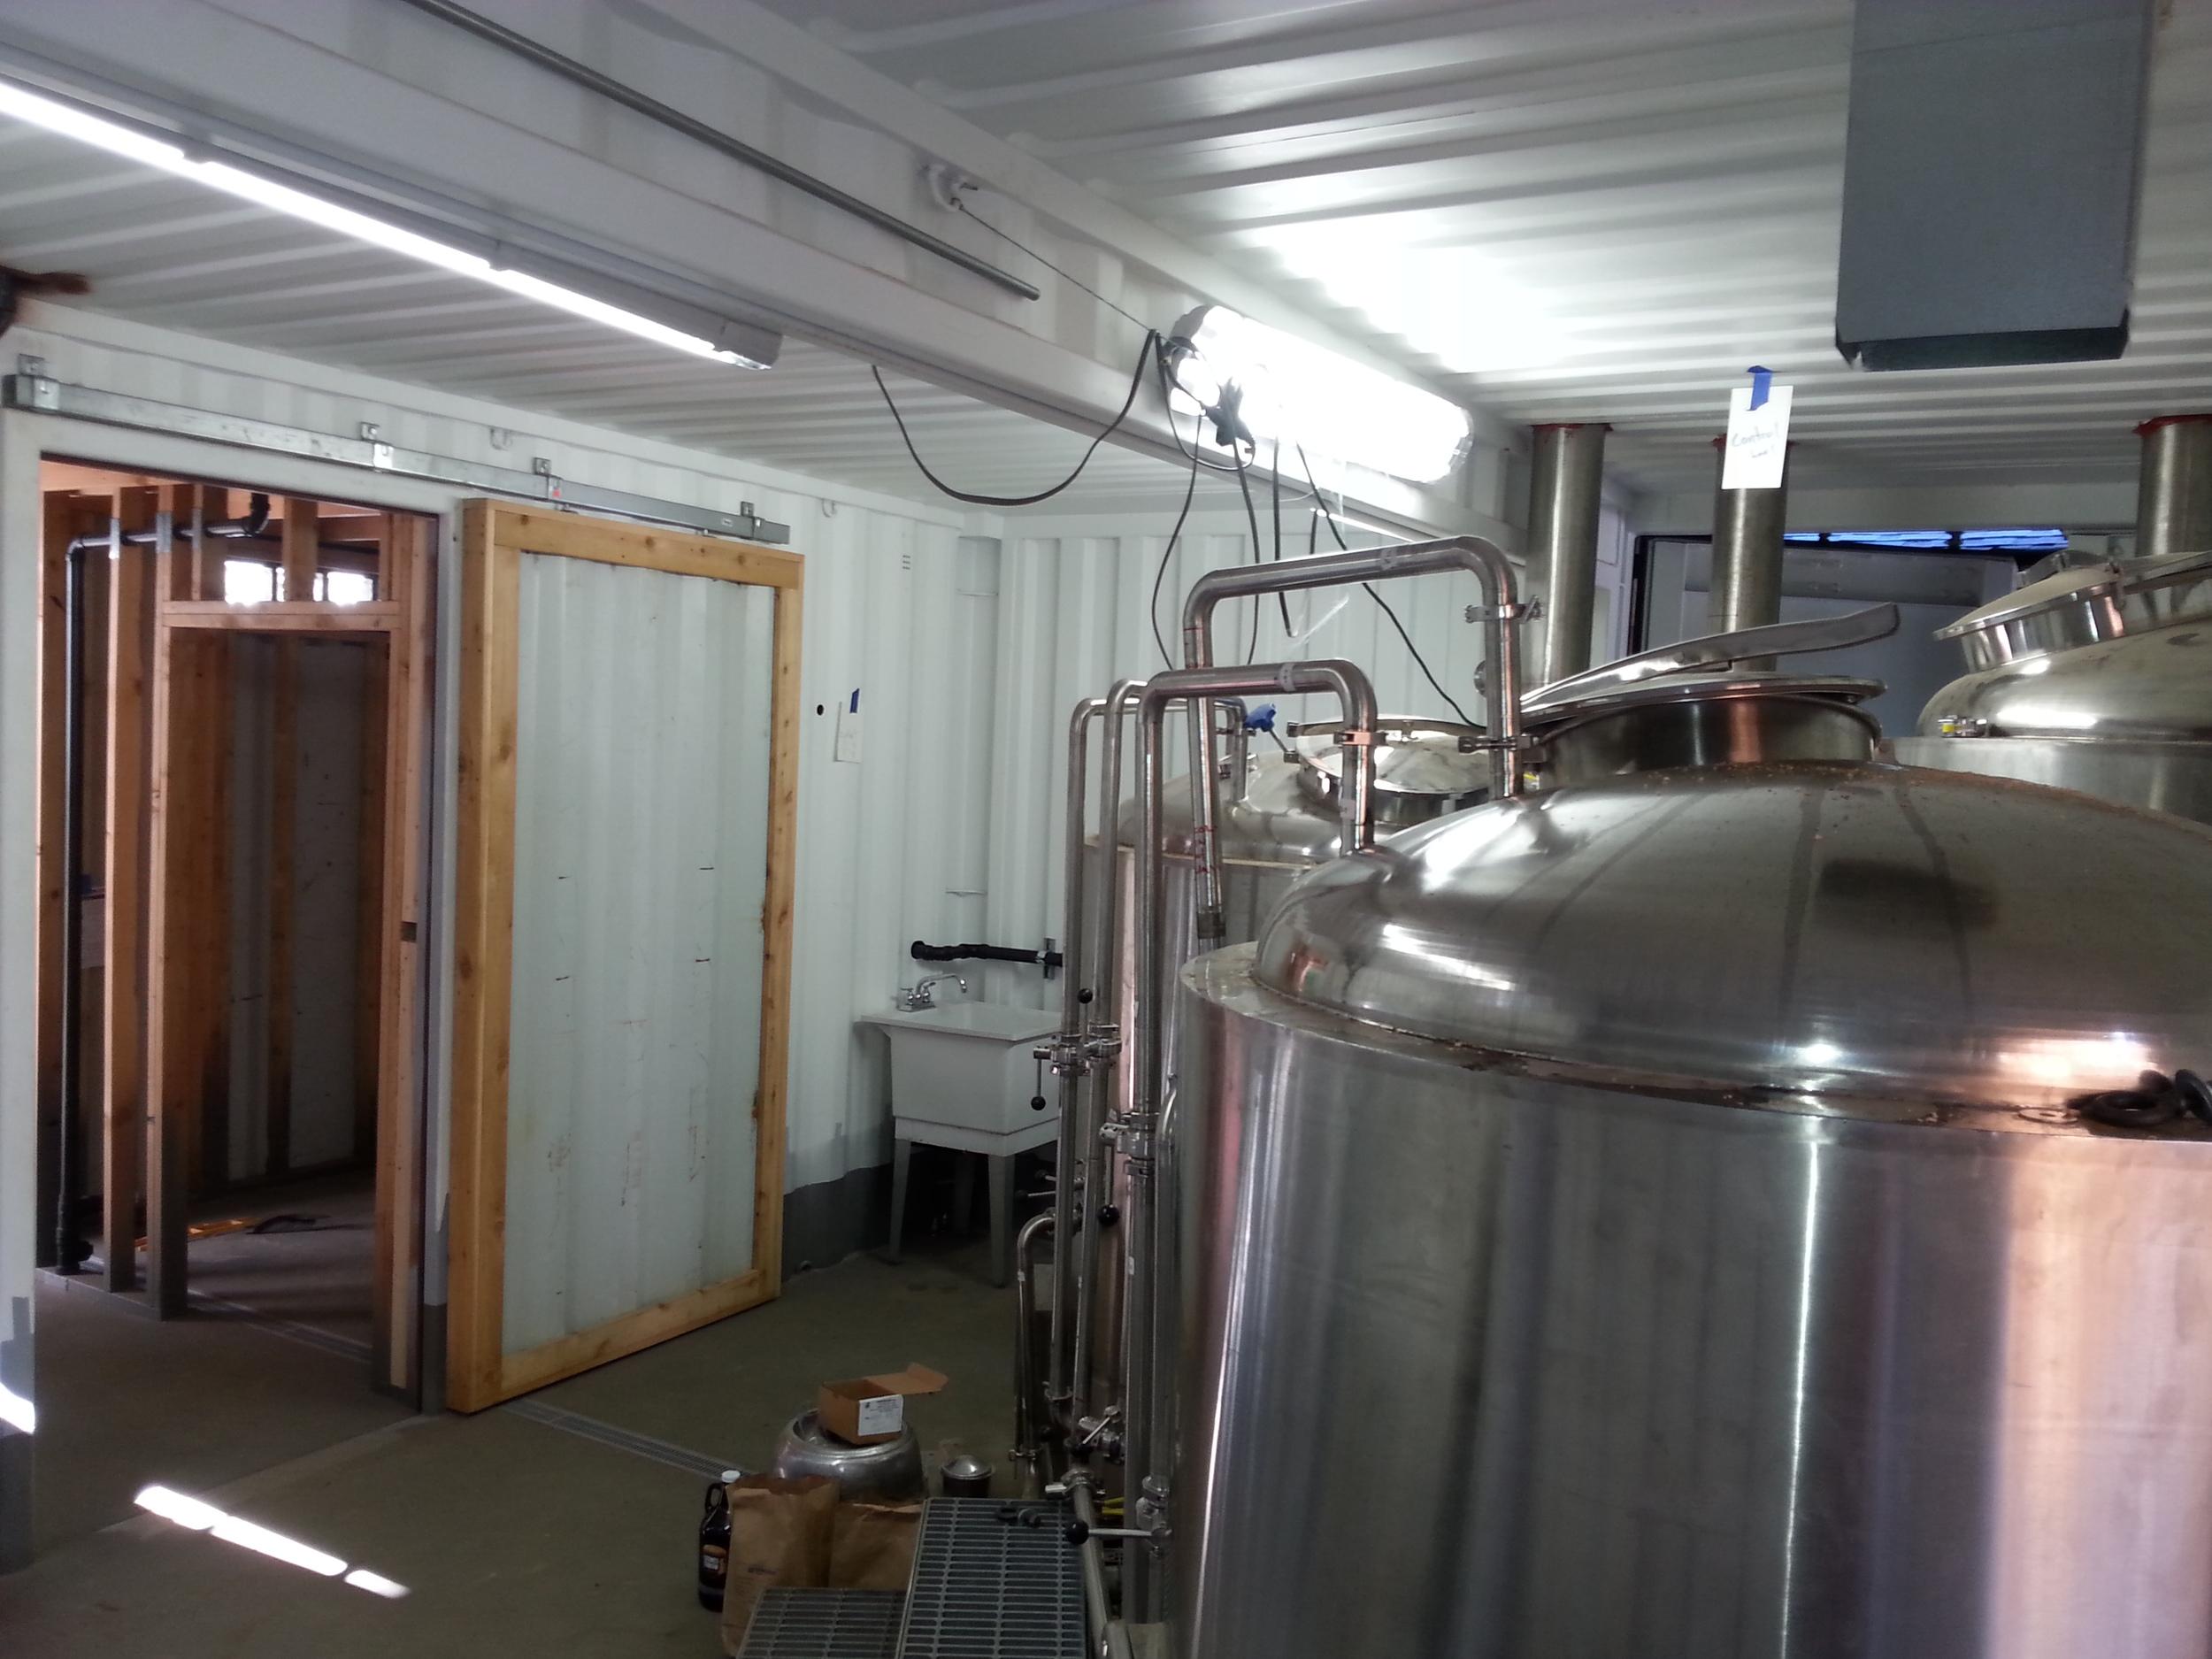 brewhouse looking into bathrooms.jpg